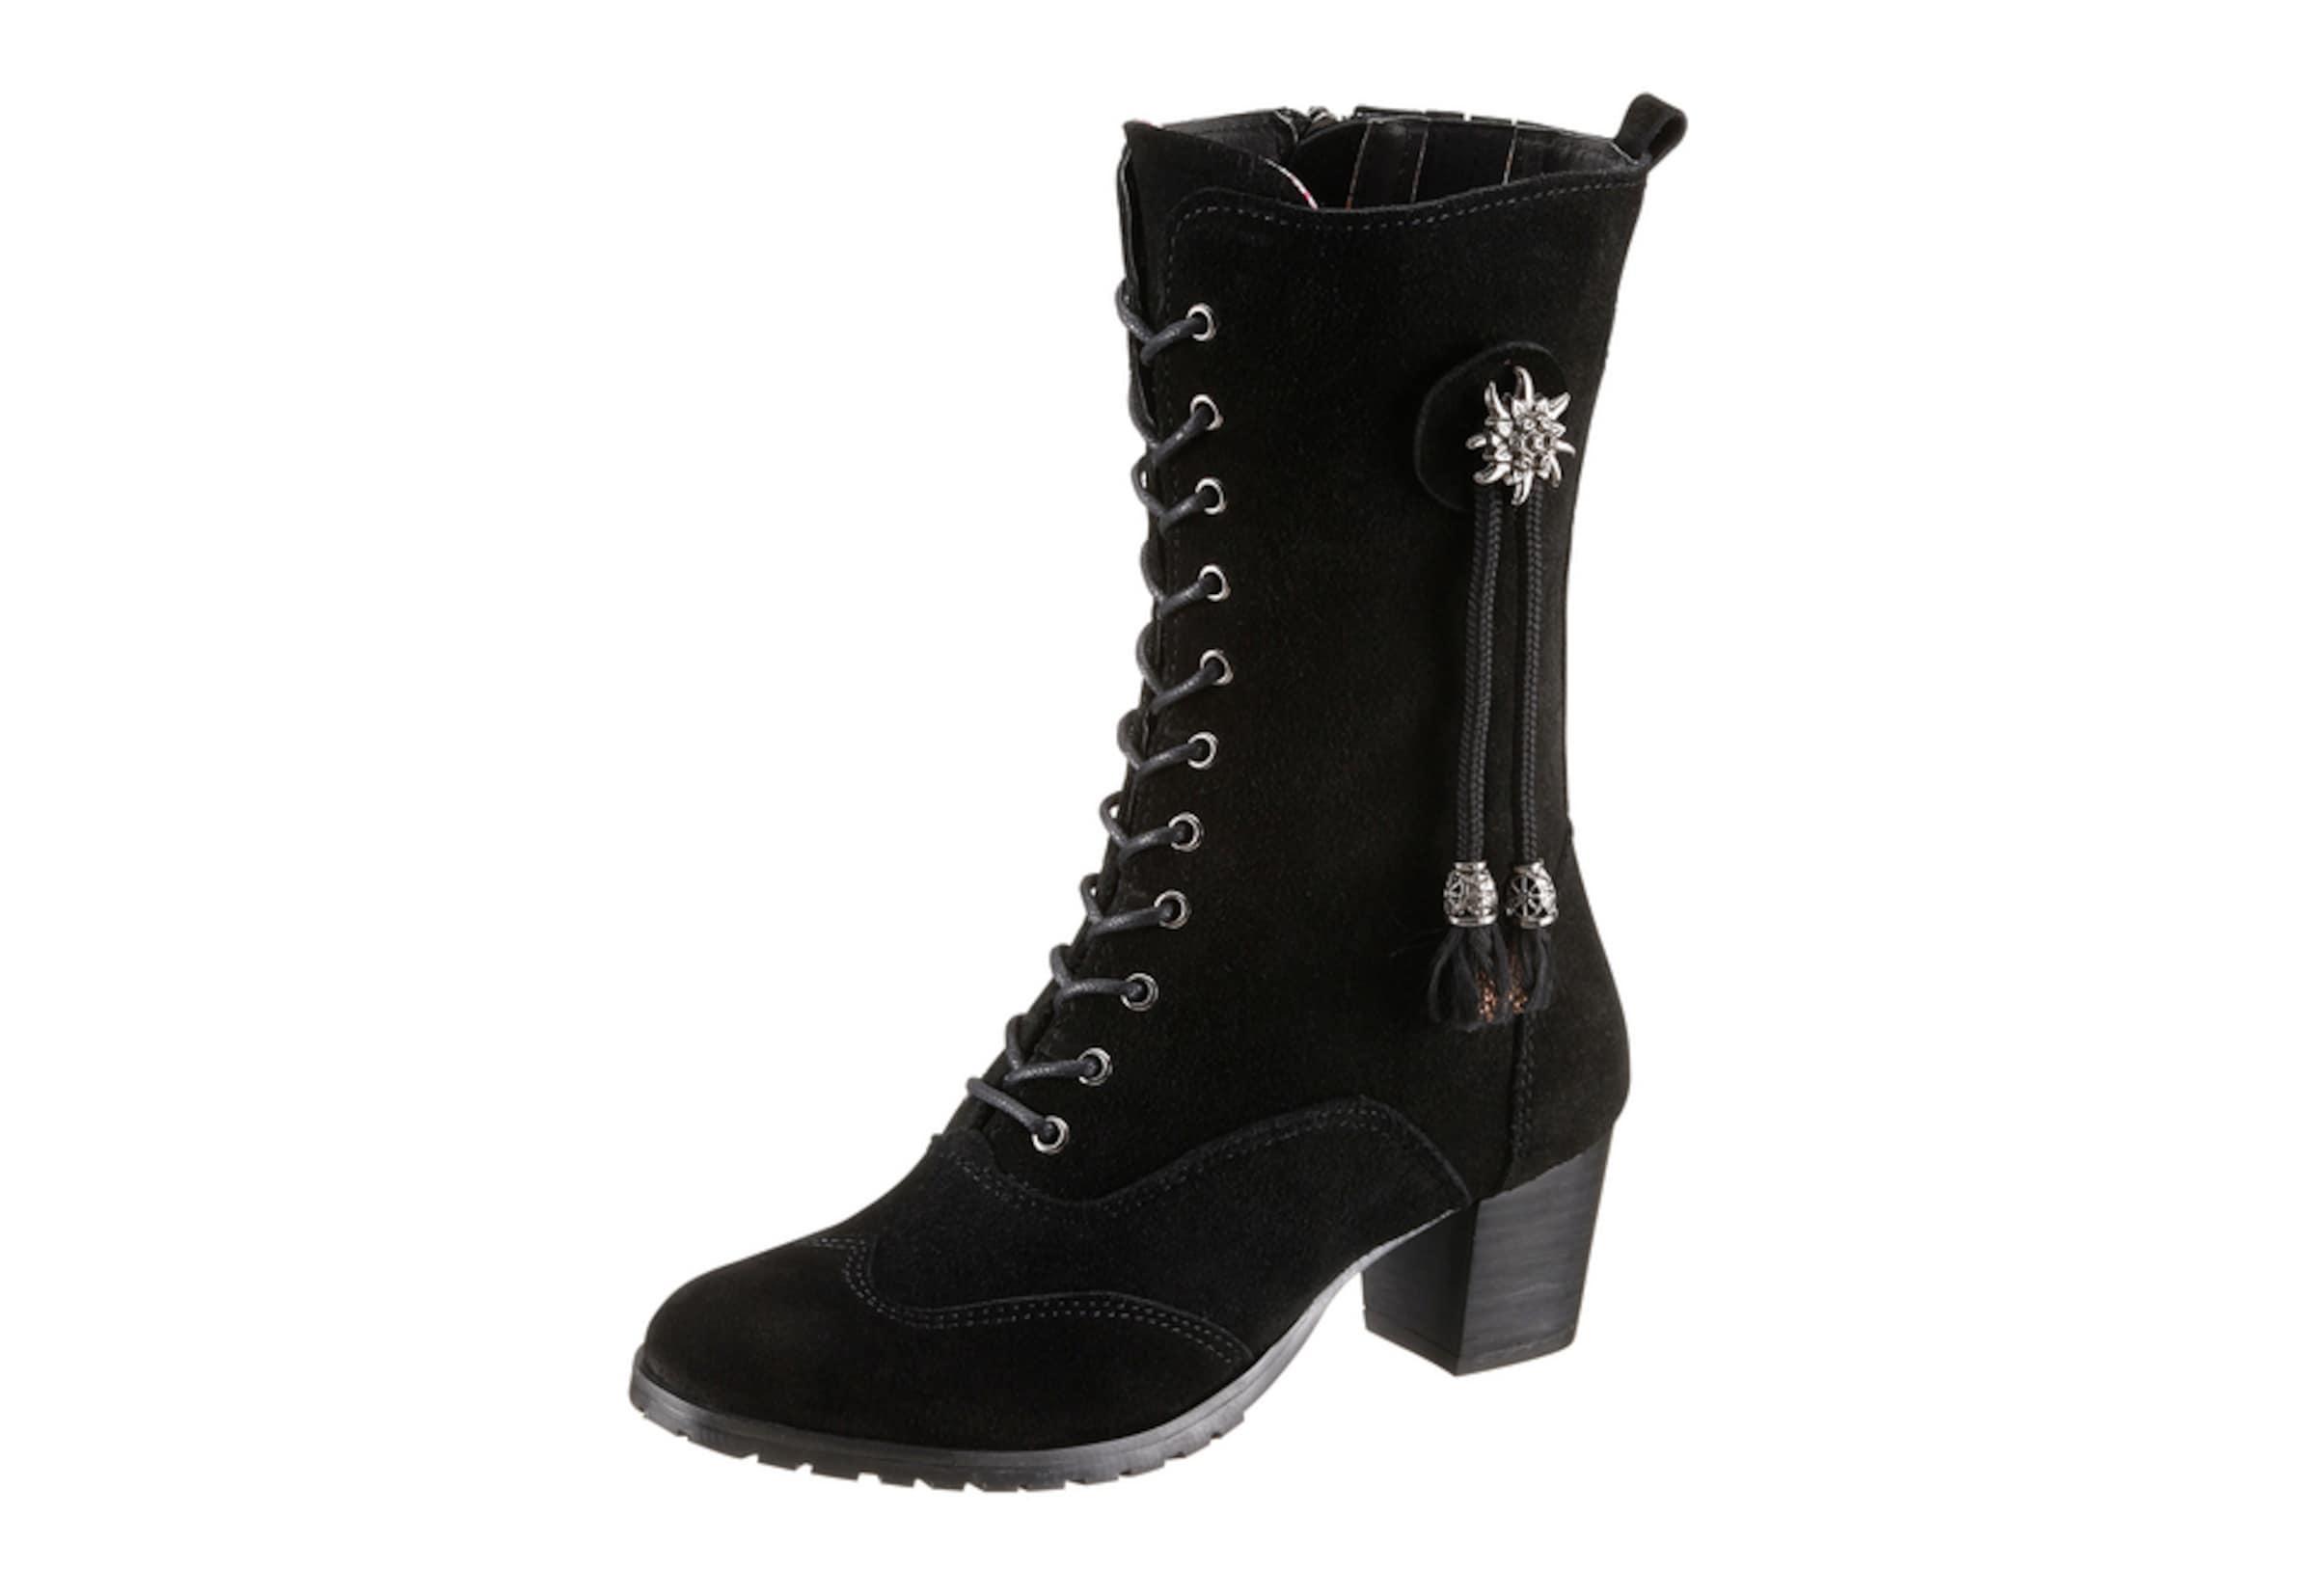 ANDREA CONTI Stiefelette Verschleißfeste billige Schuhe